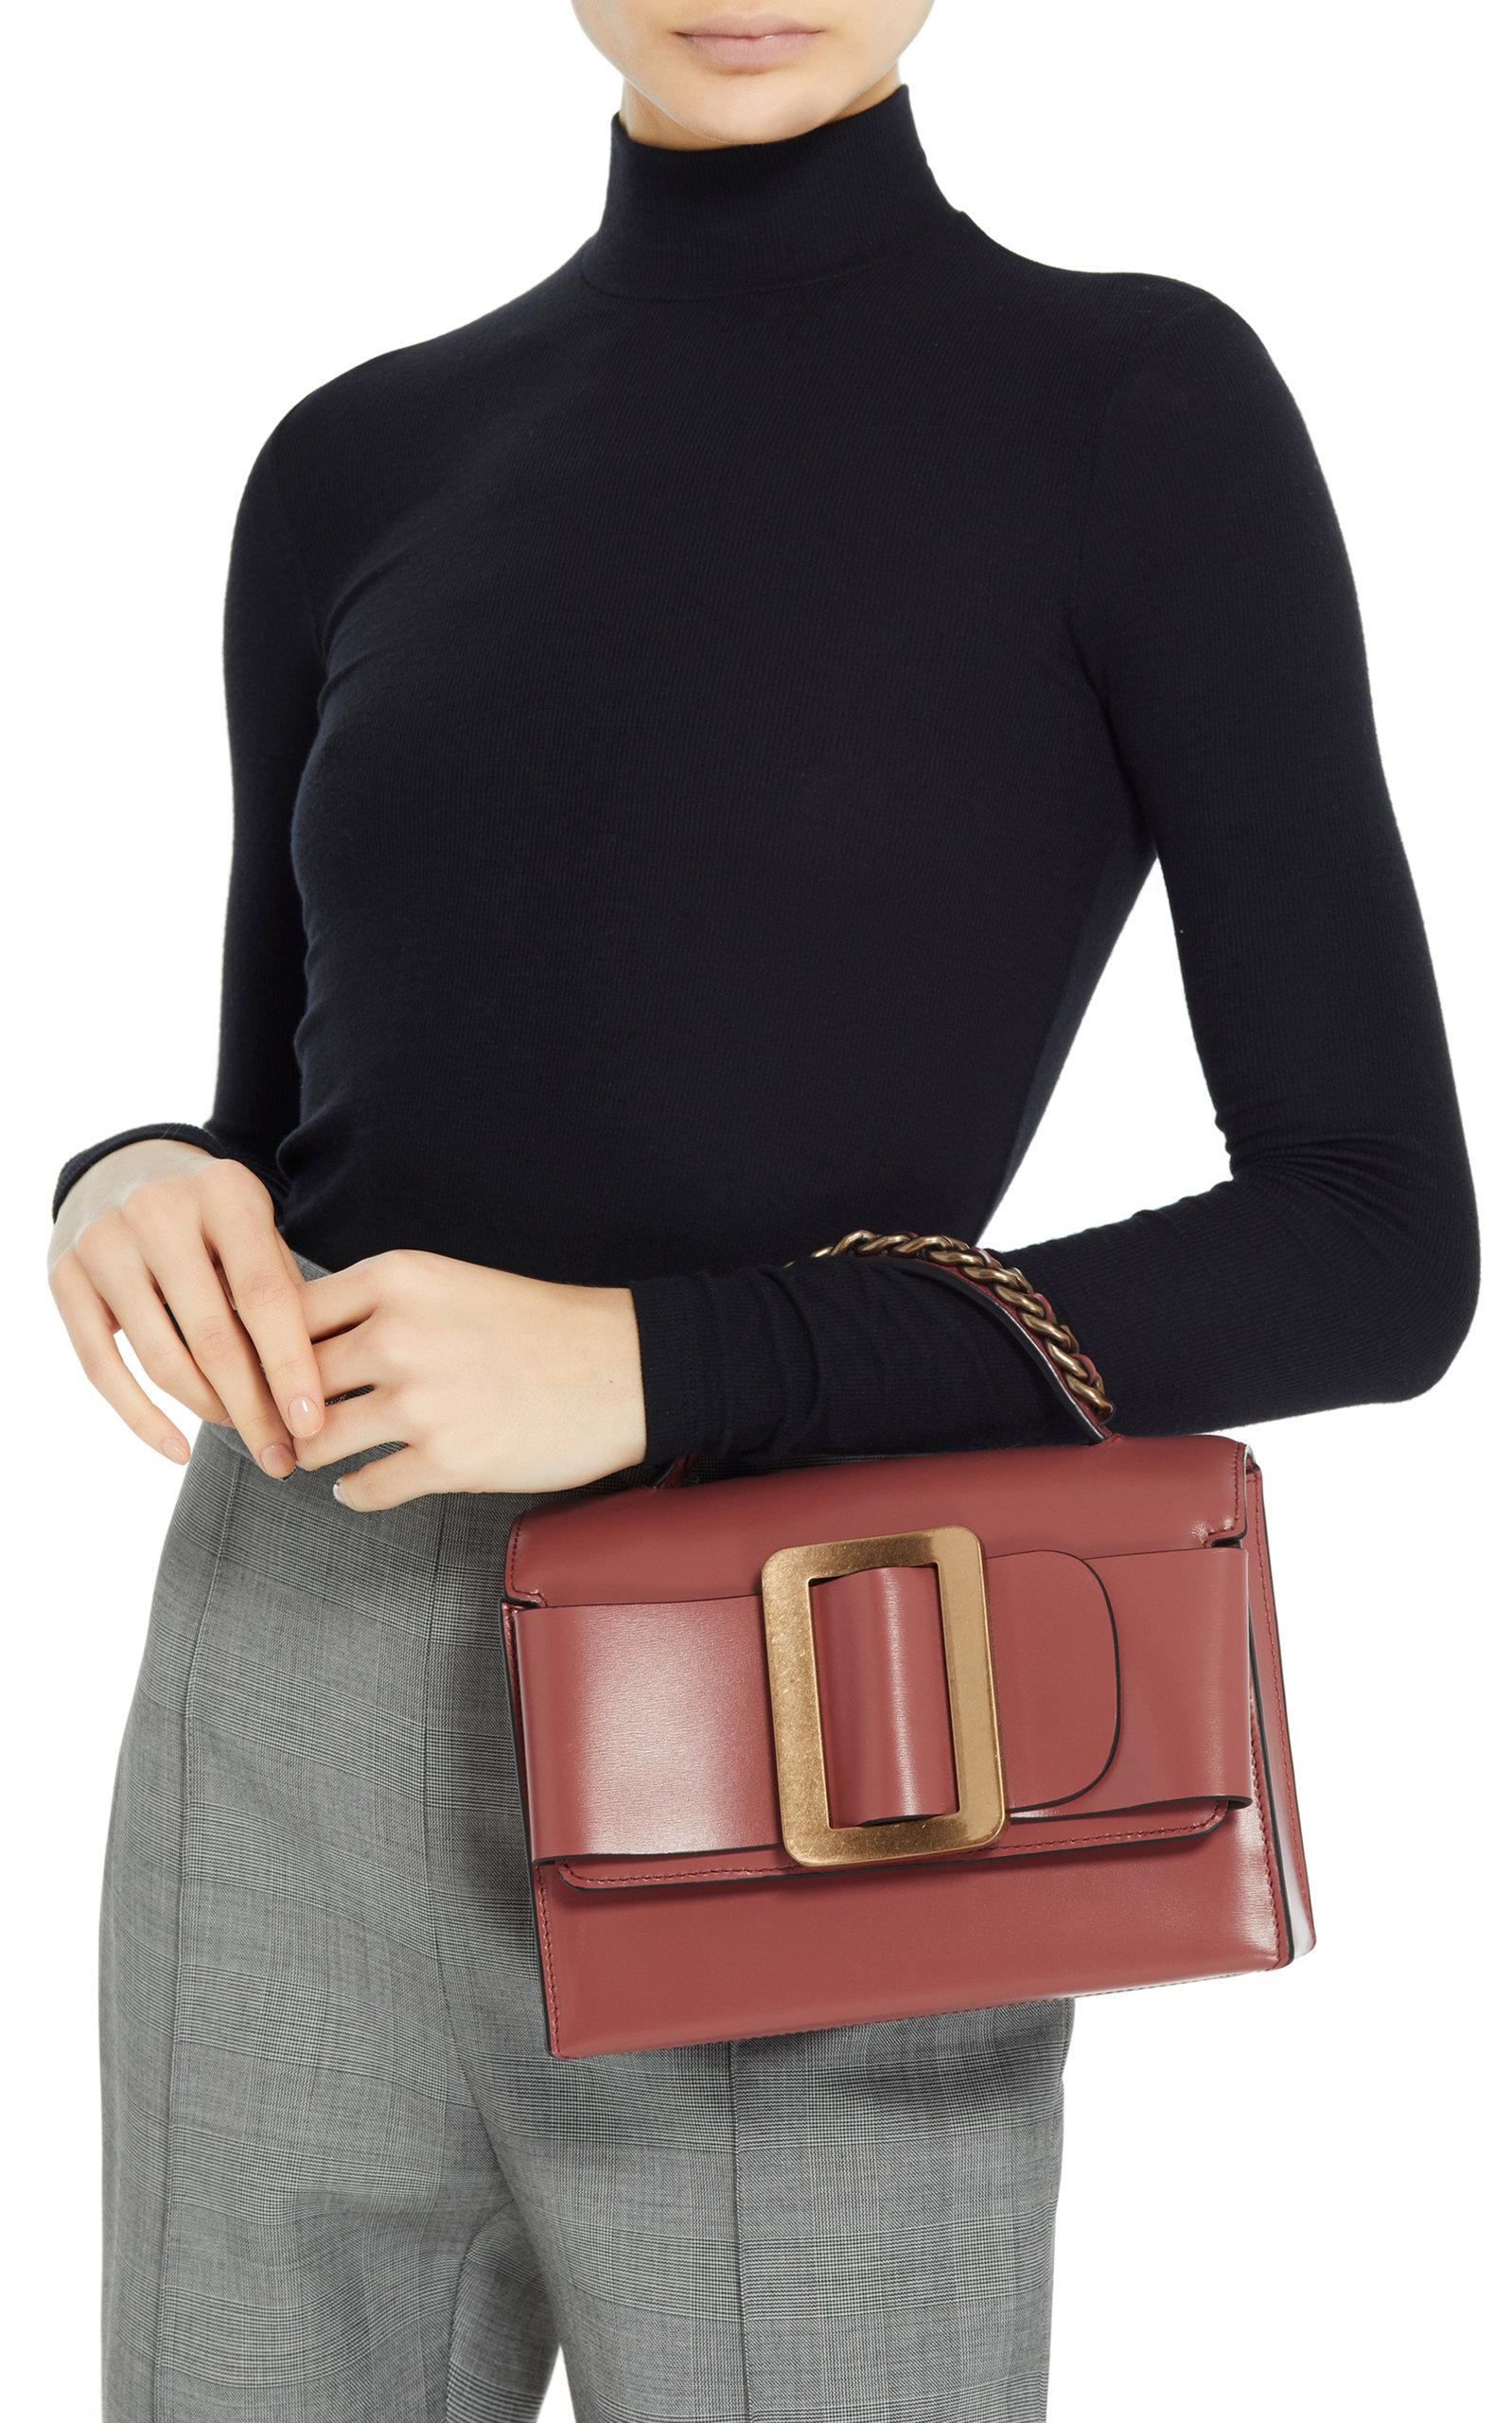 d8a7a5a87 Fred 23 Leather Top Handle Bag by BOYY | Moda Operandi